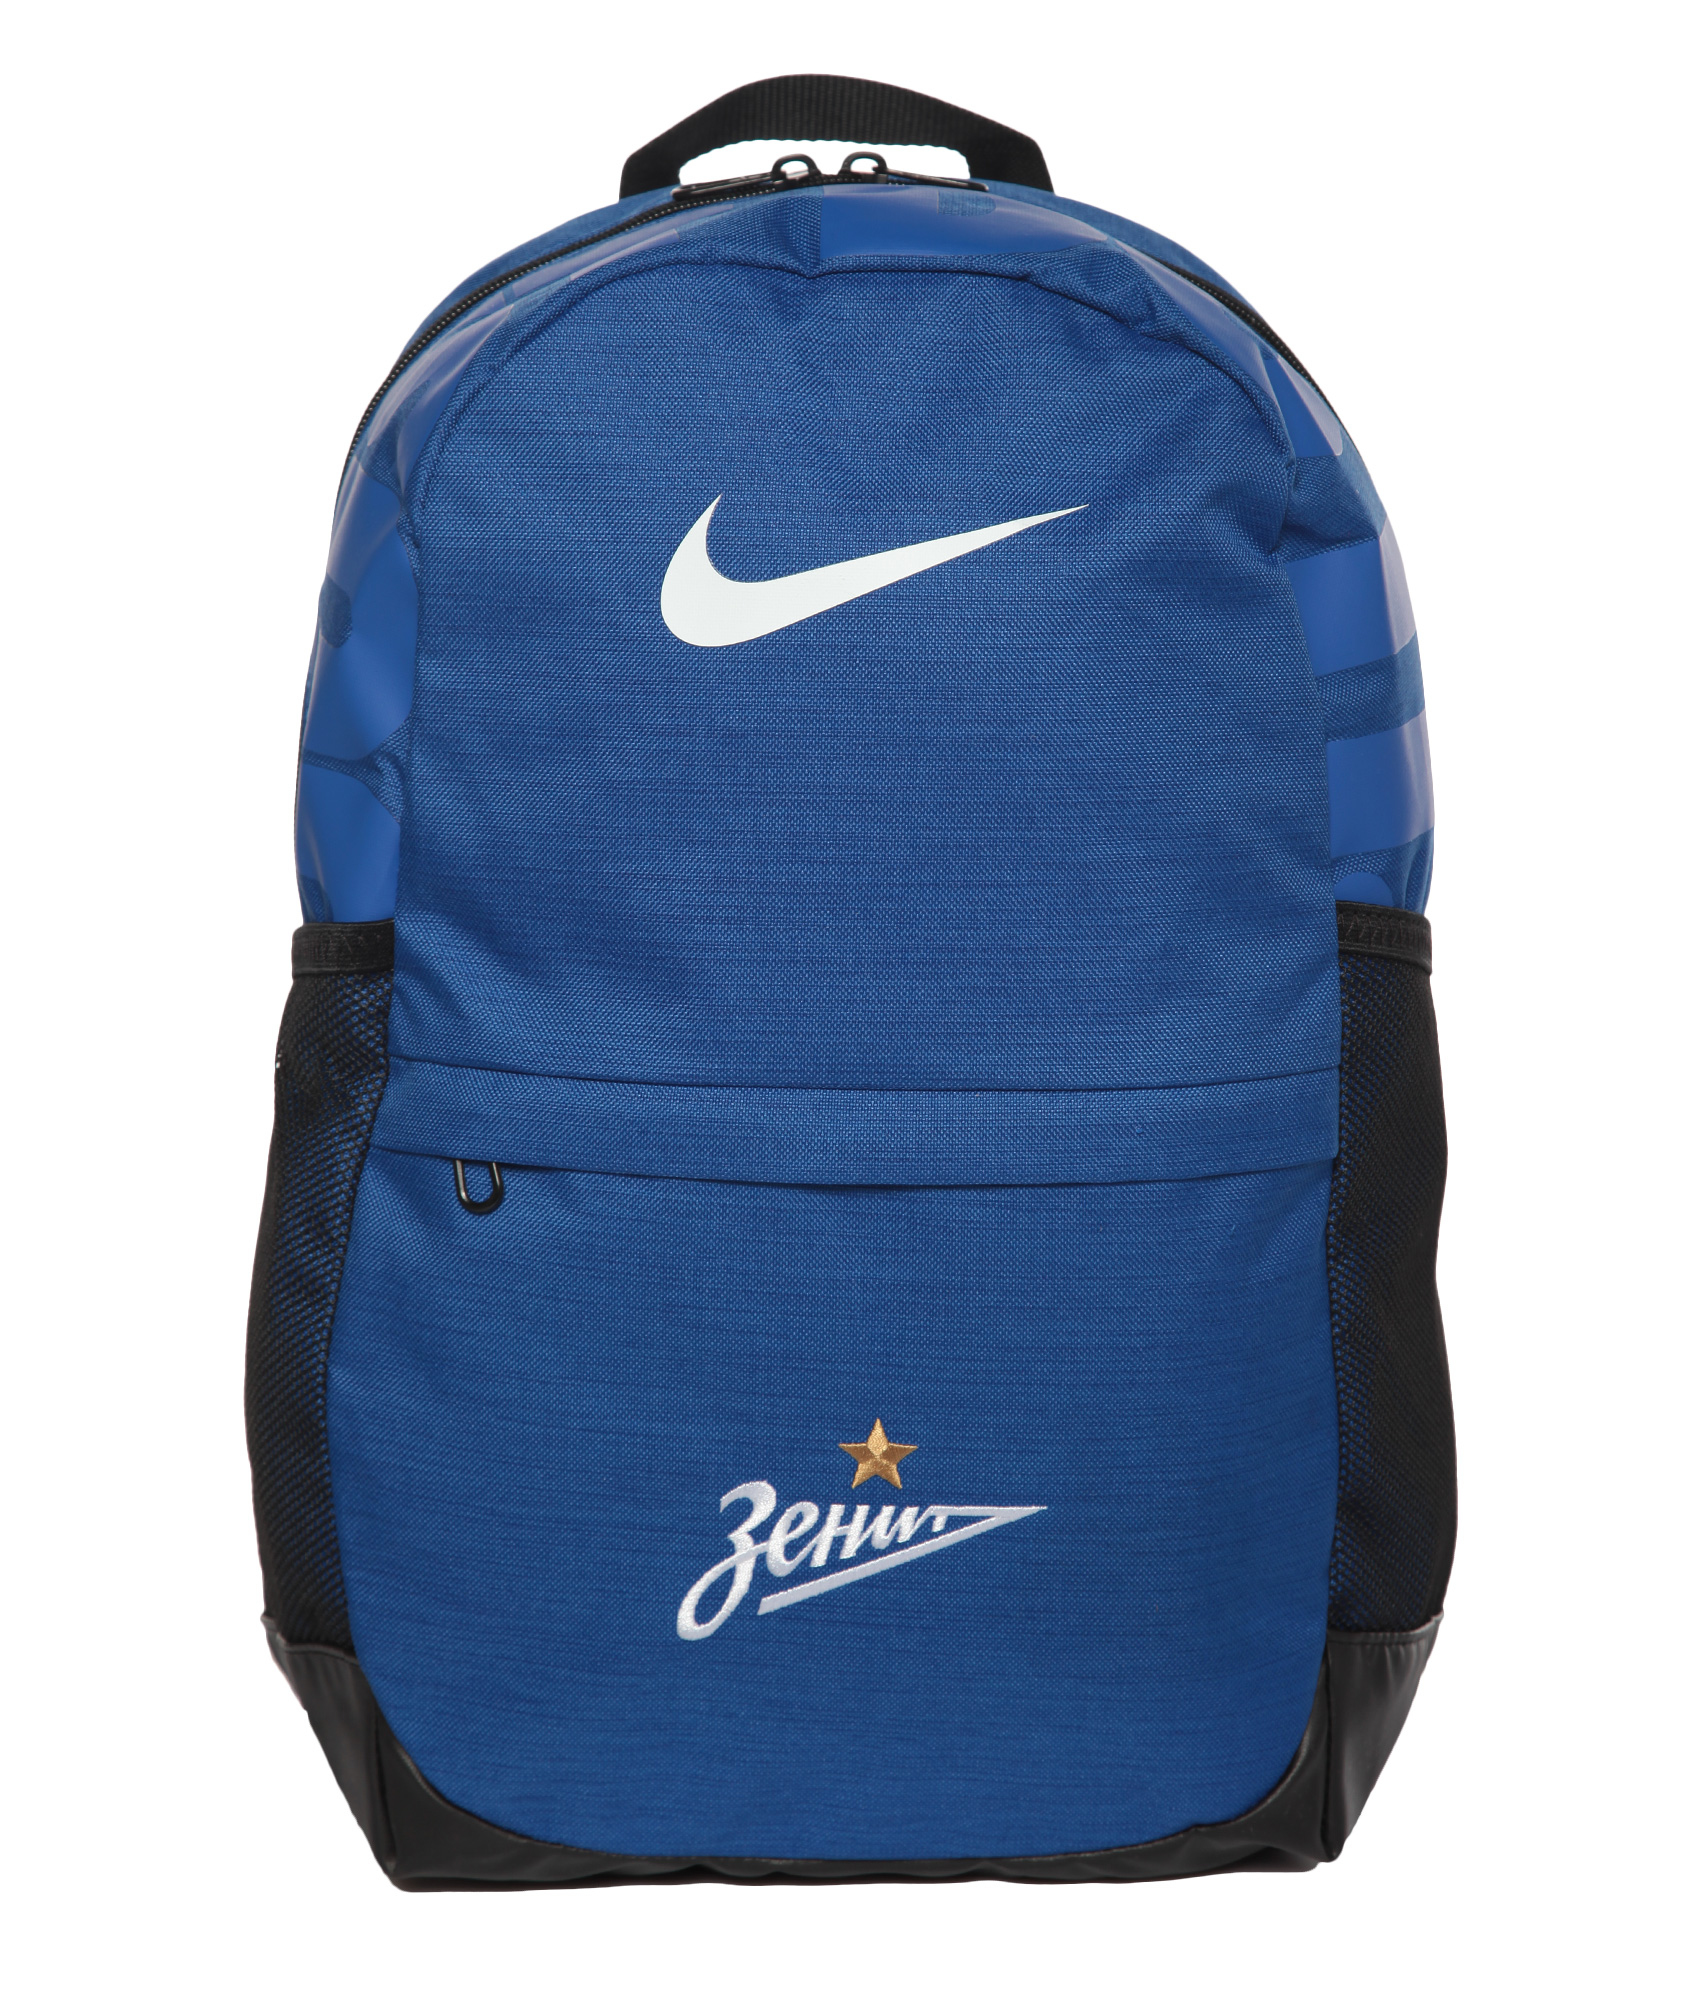 Рюкзак детский Nike, Цвет-Синий, Размер-MISC